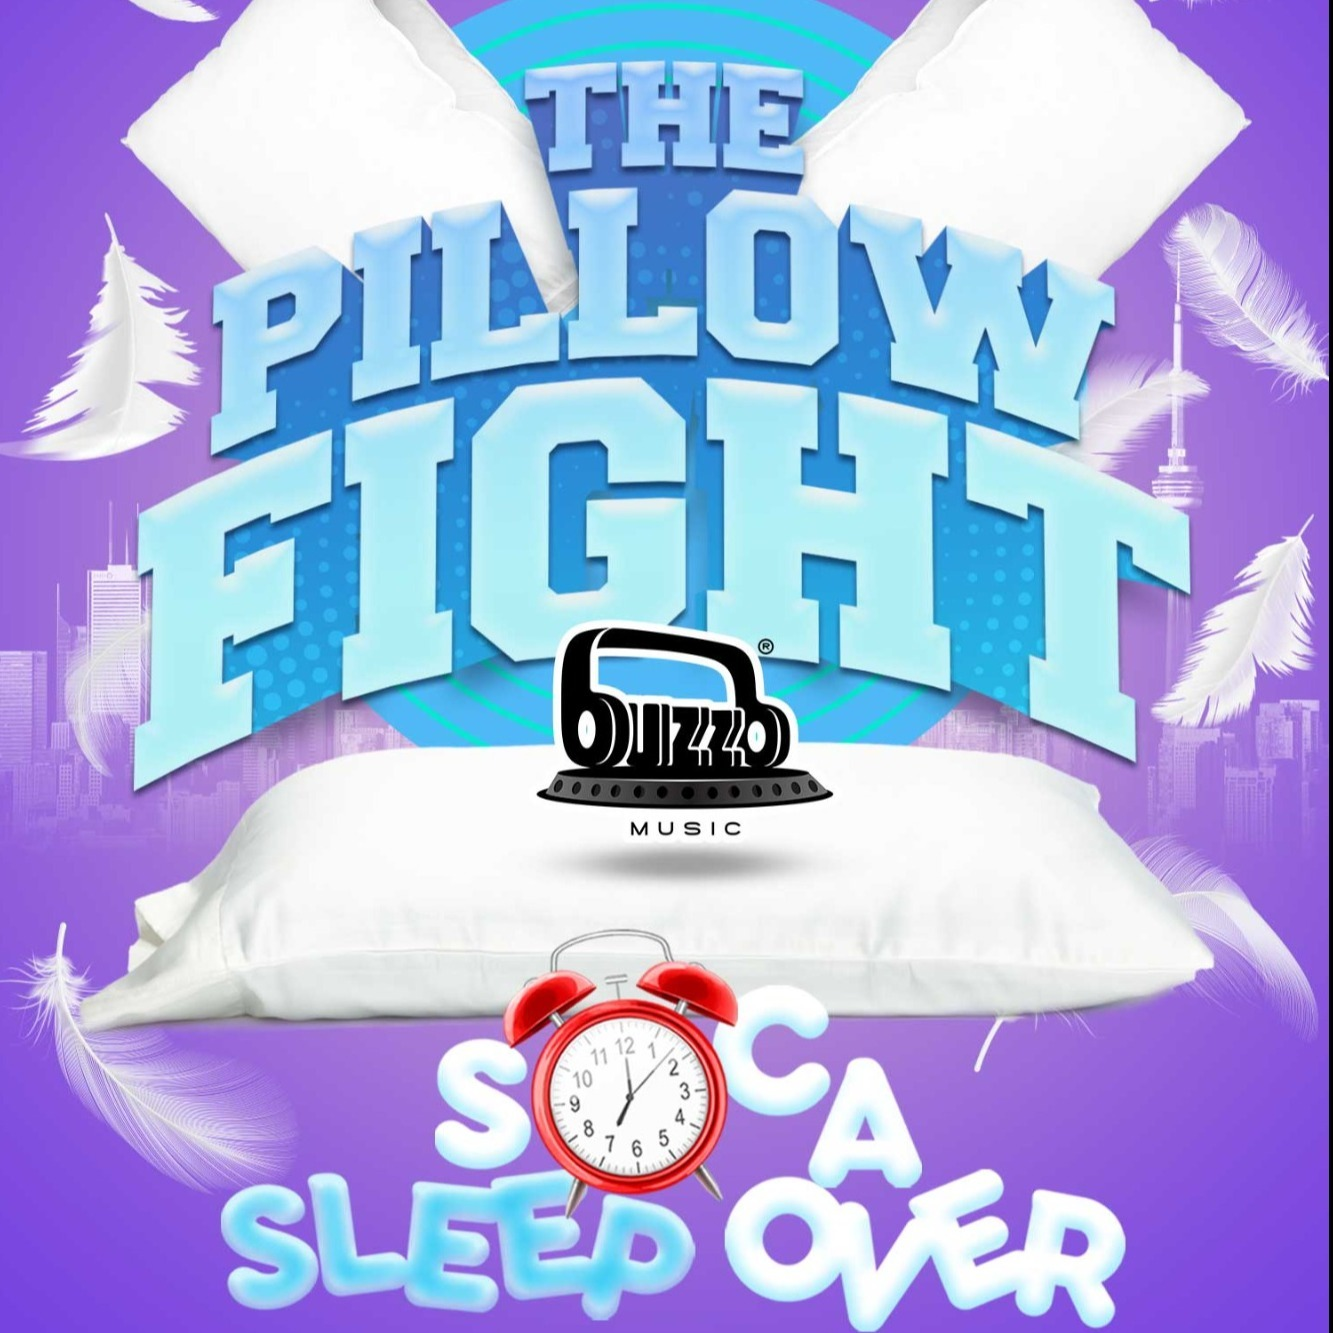 SOCA SLEEP OVER 2021 - The Breakfast Inclusive Pajama Fete!